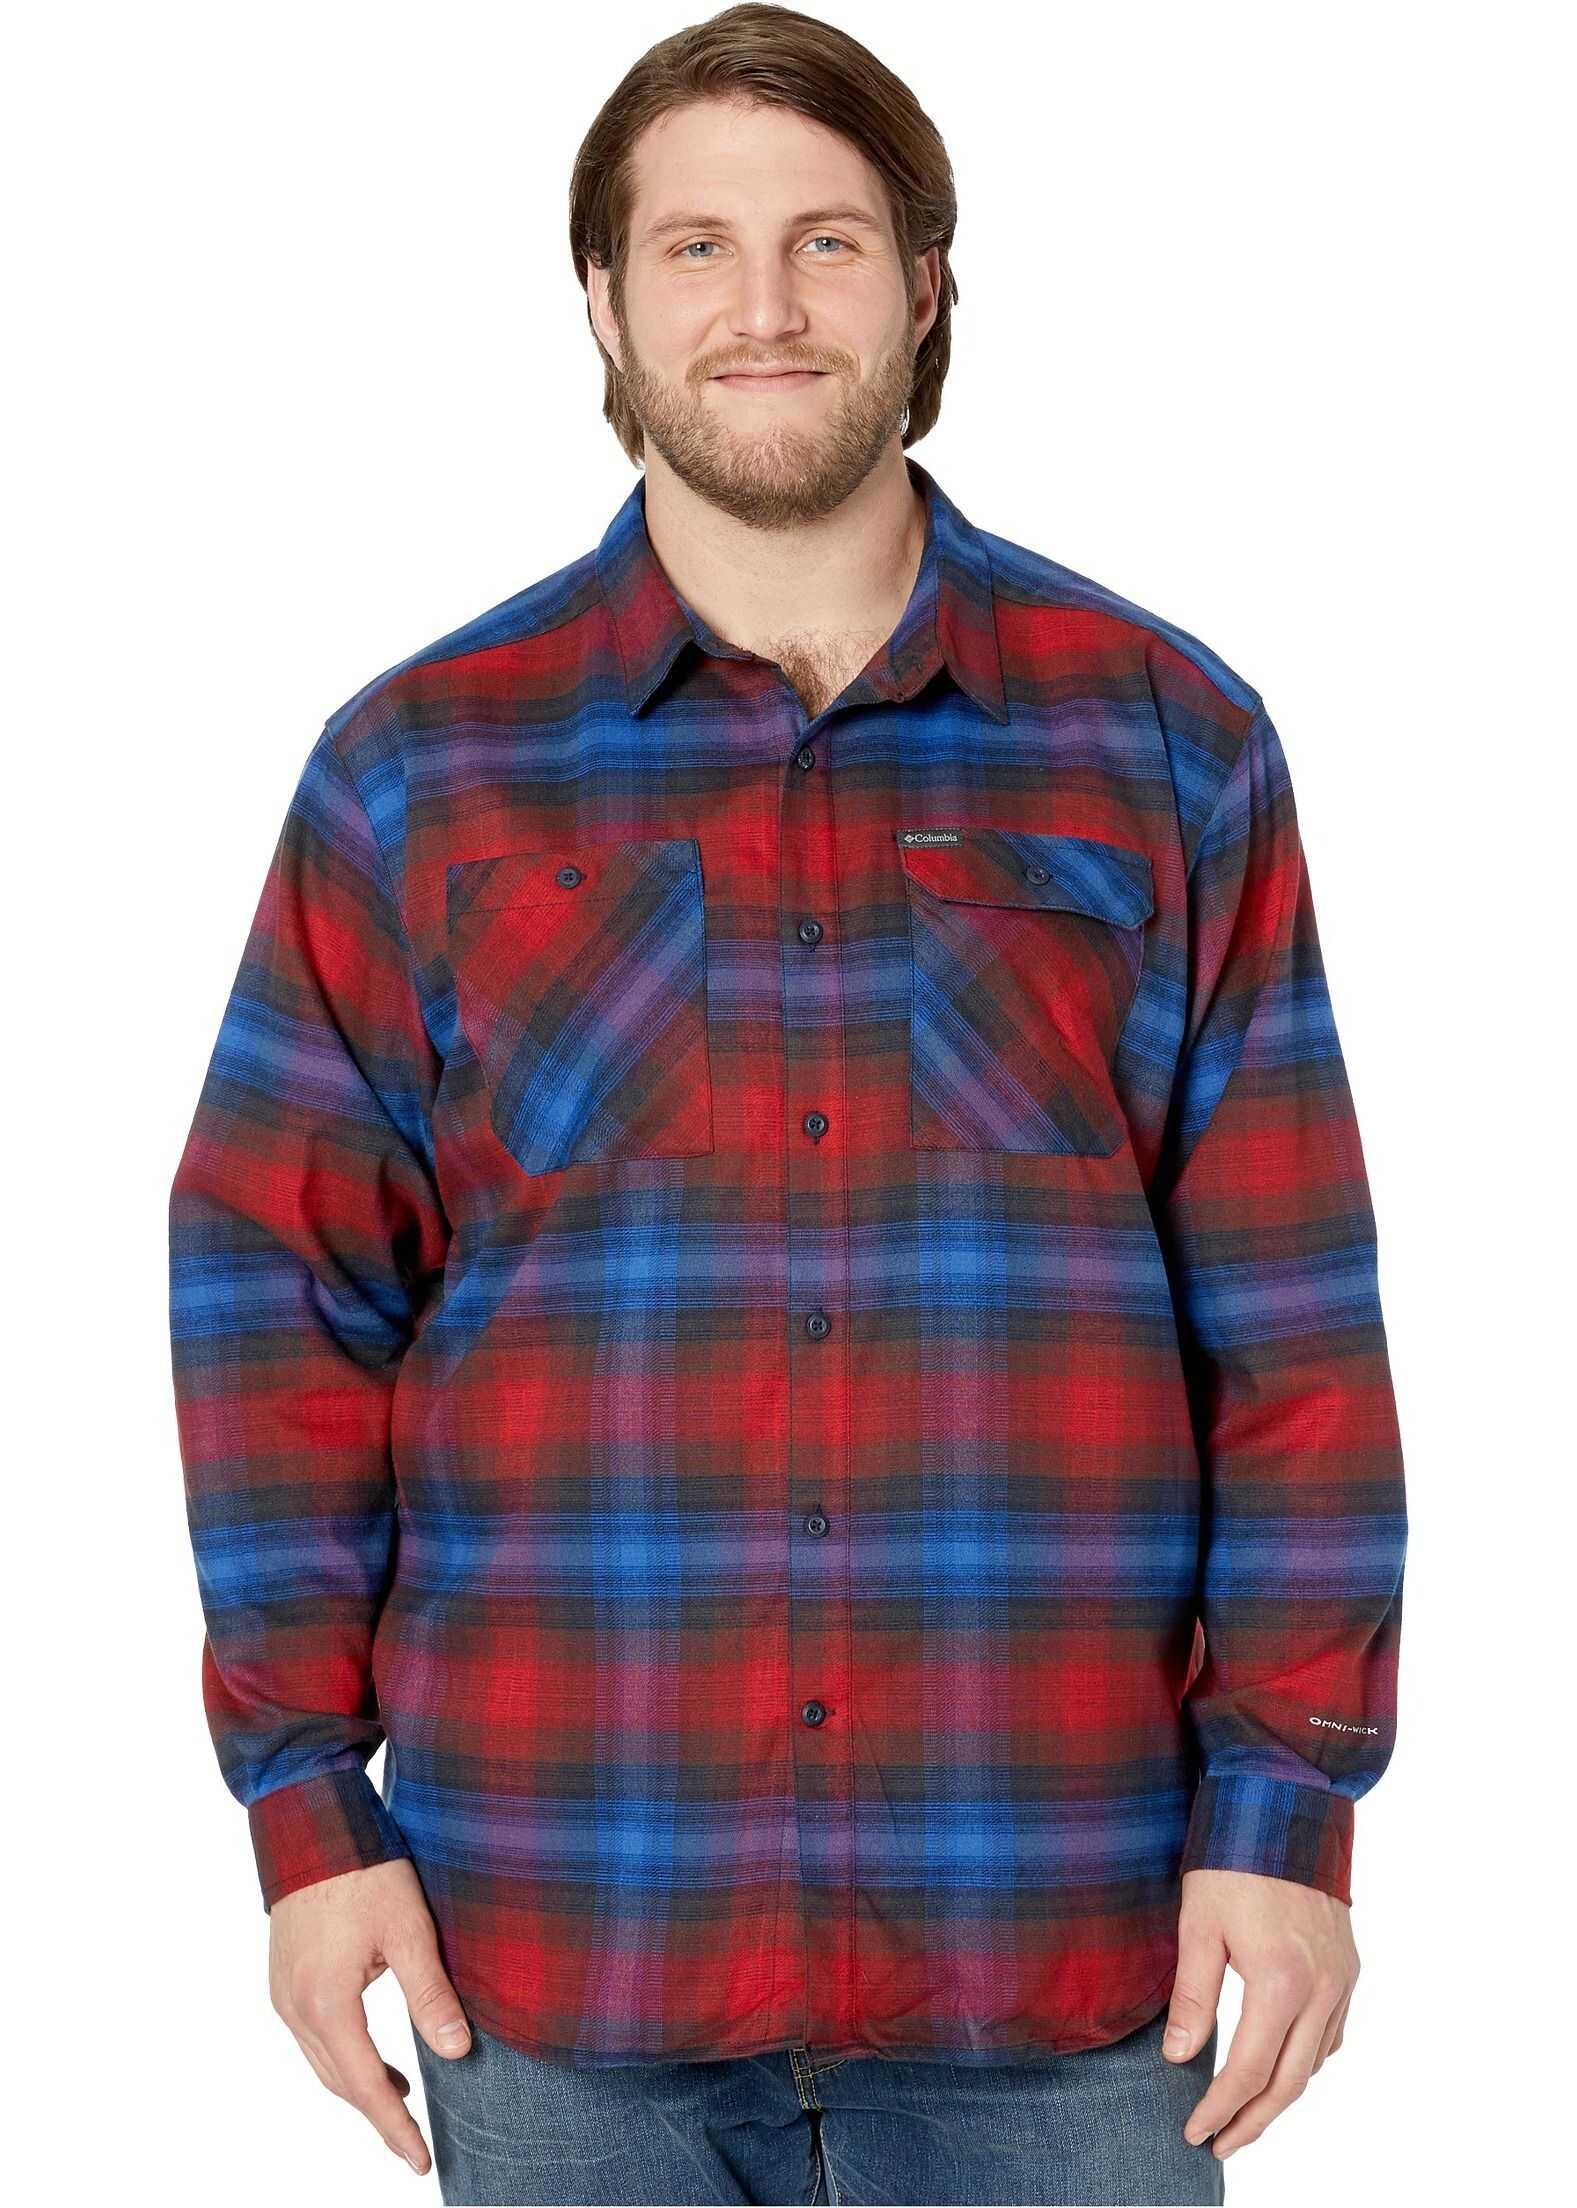 Columbia Big & Tall Outdoor Elements™ Stretch Flannel Red Jasper Plaid